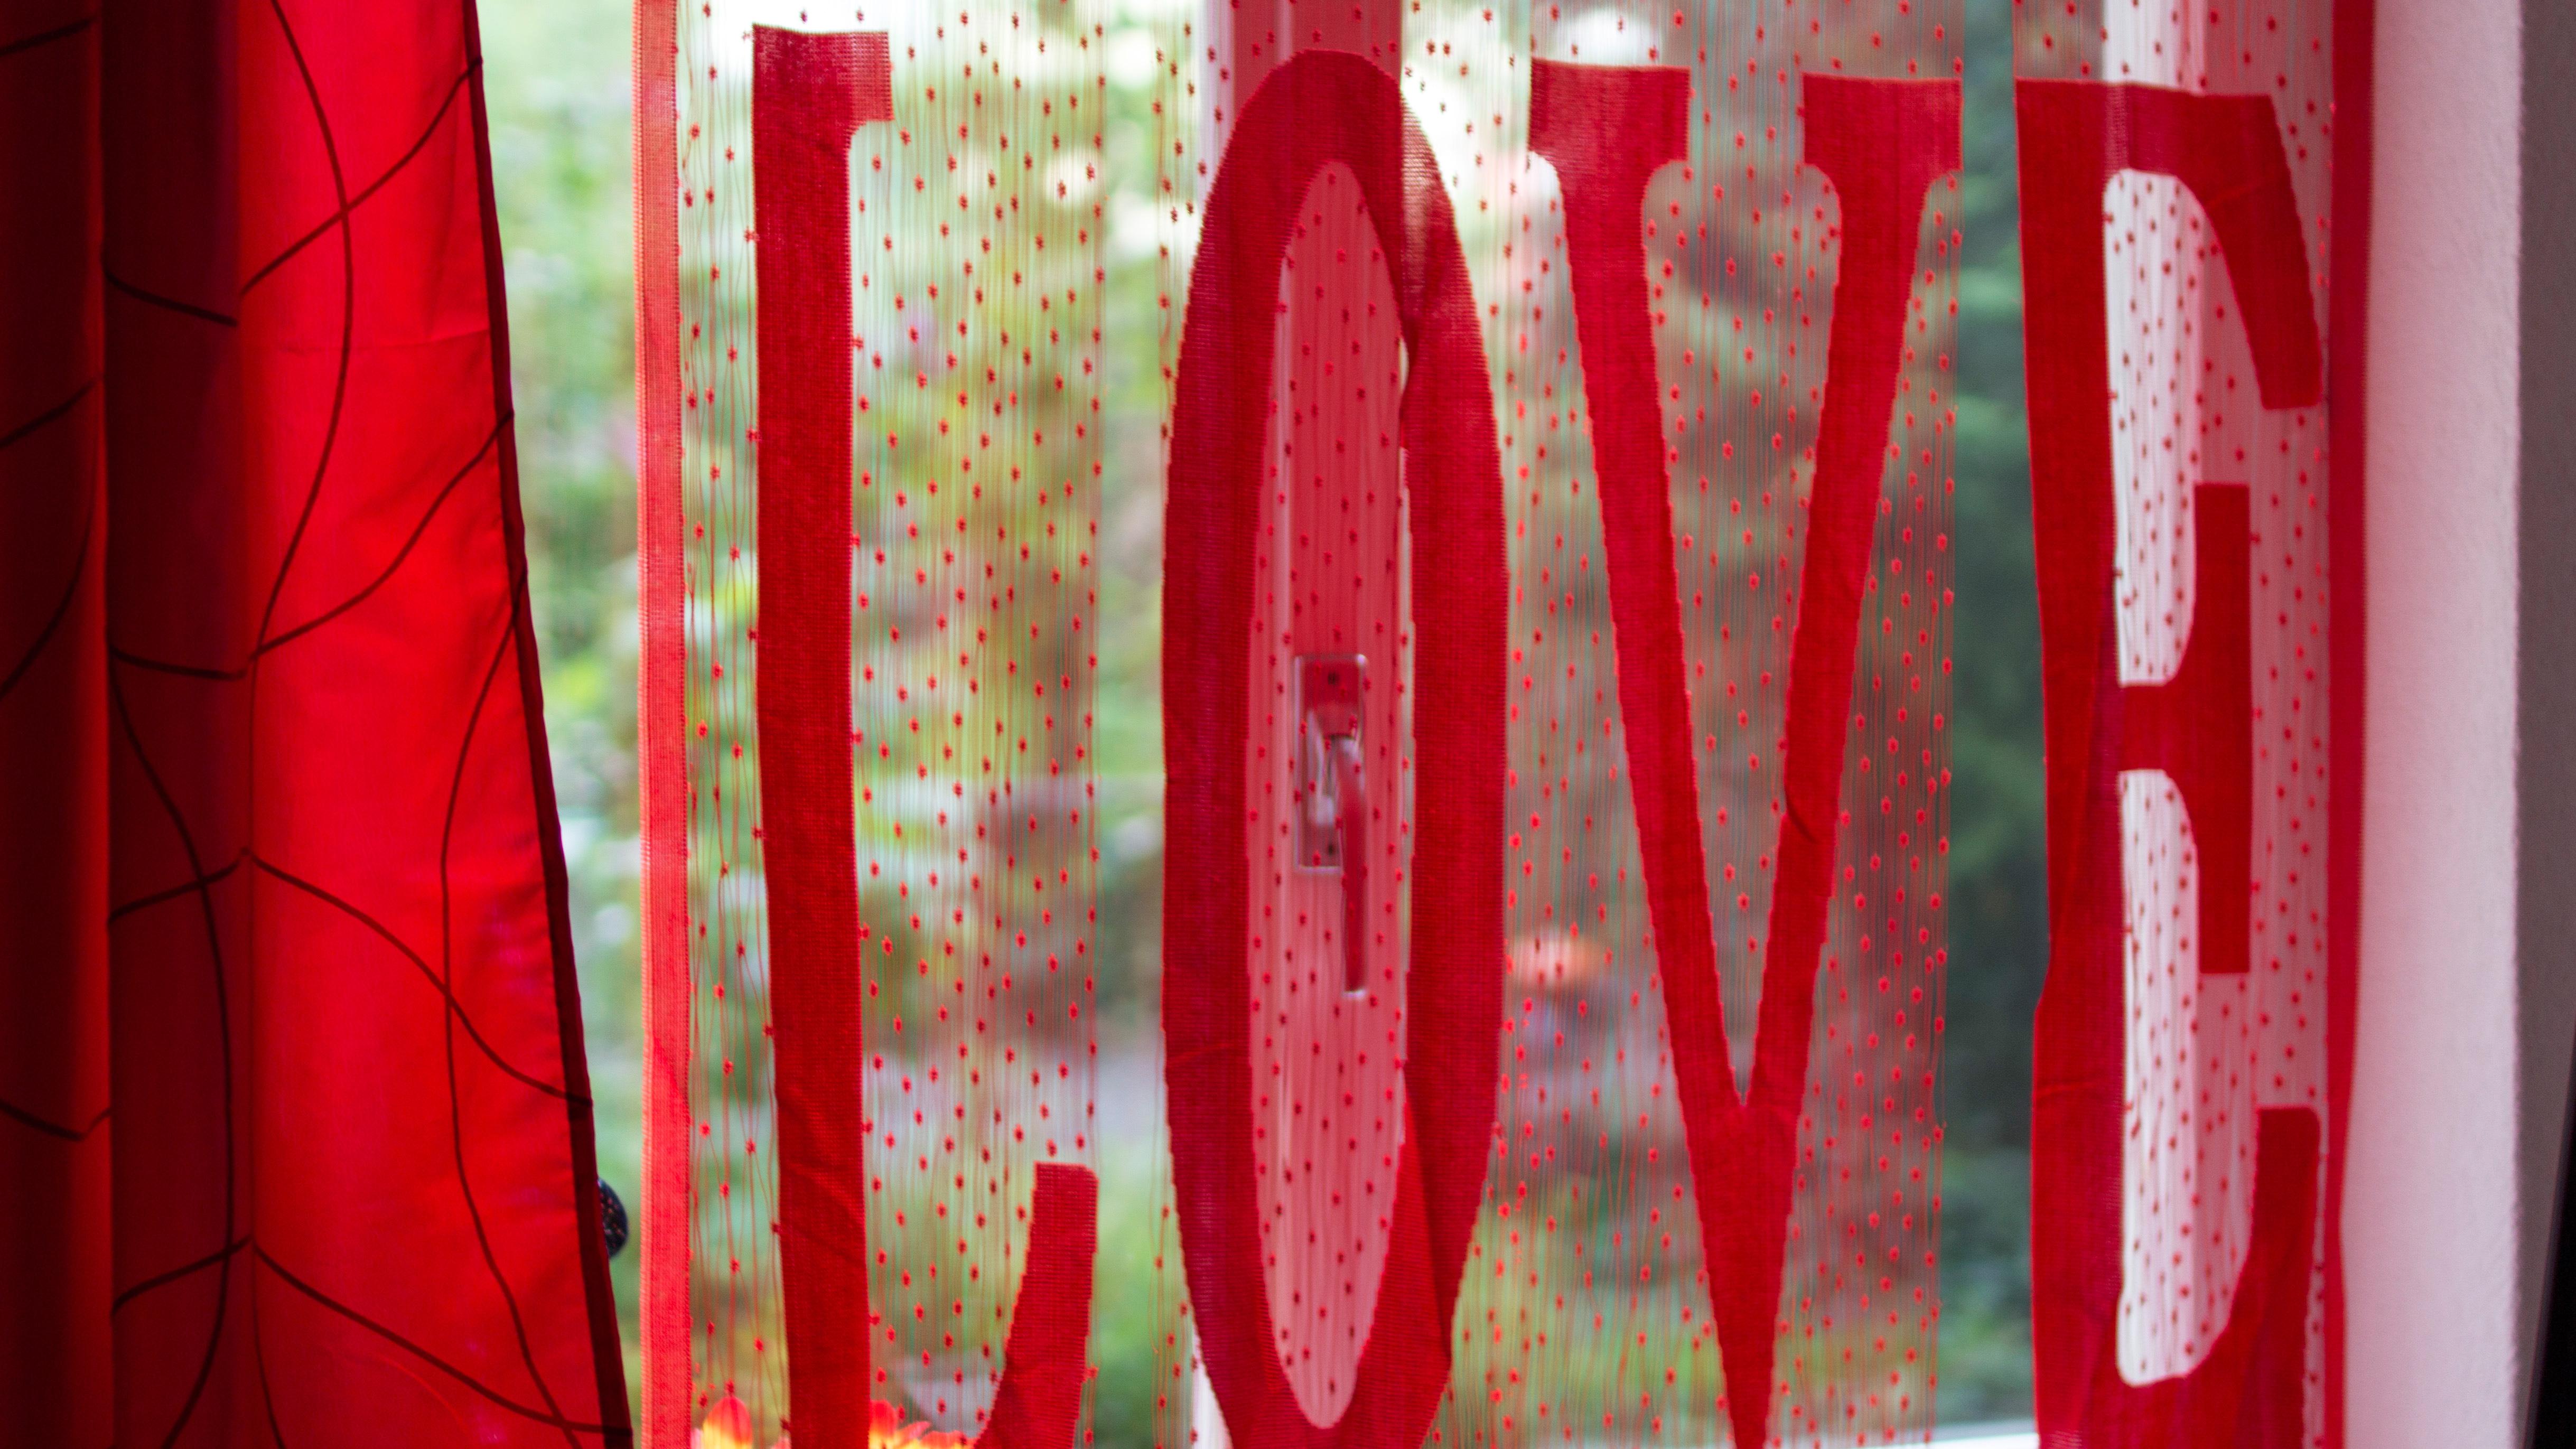 Love in the window